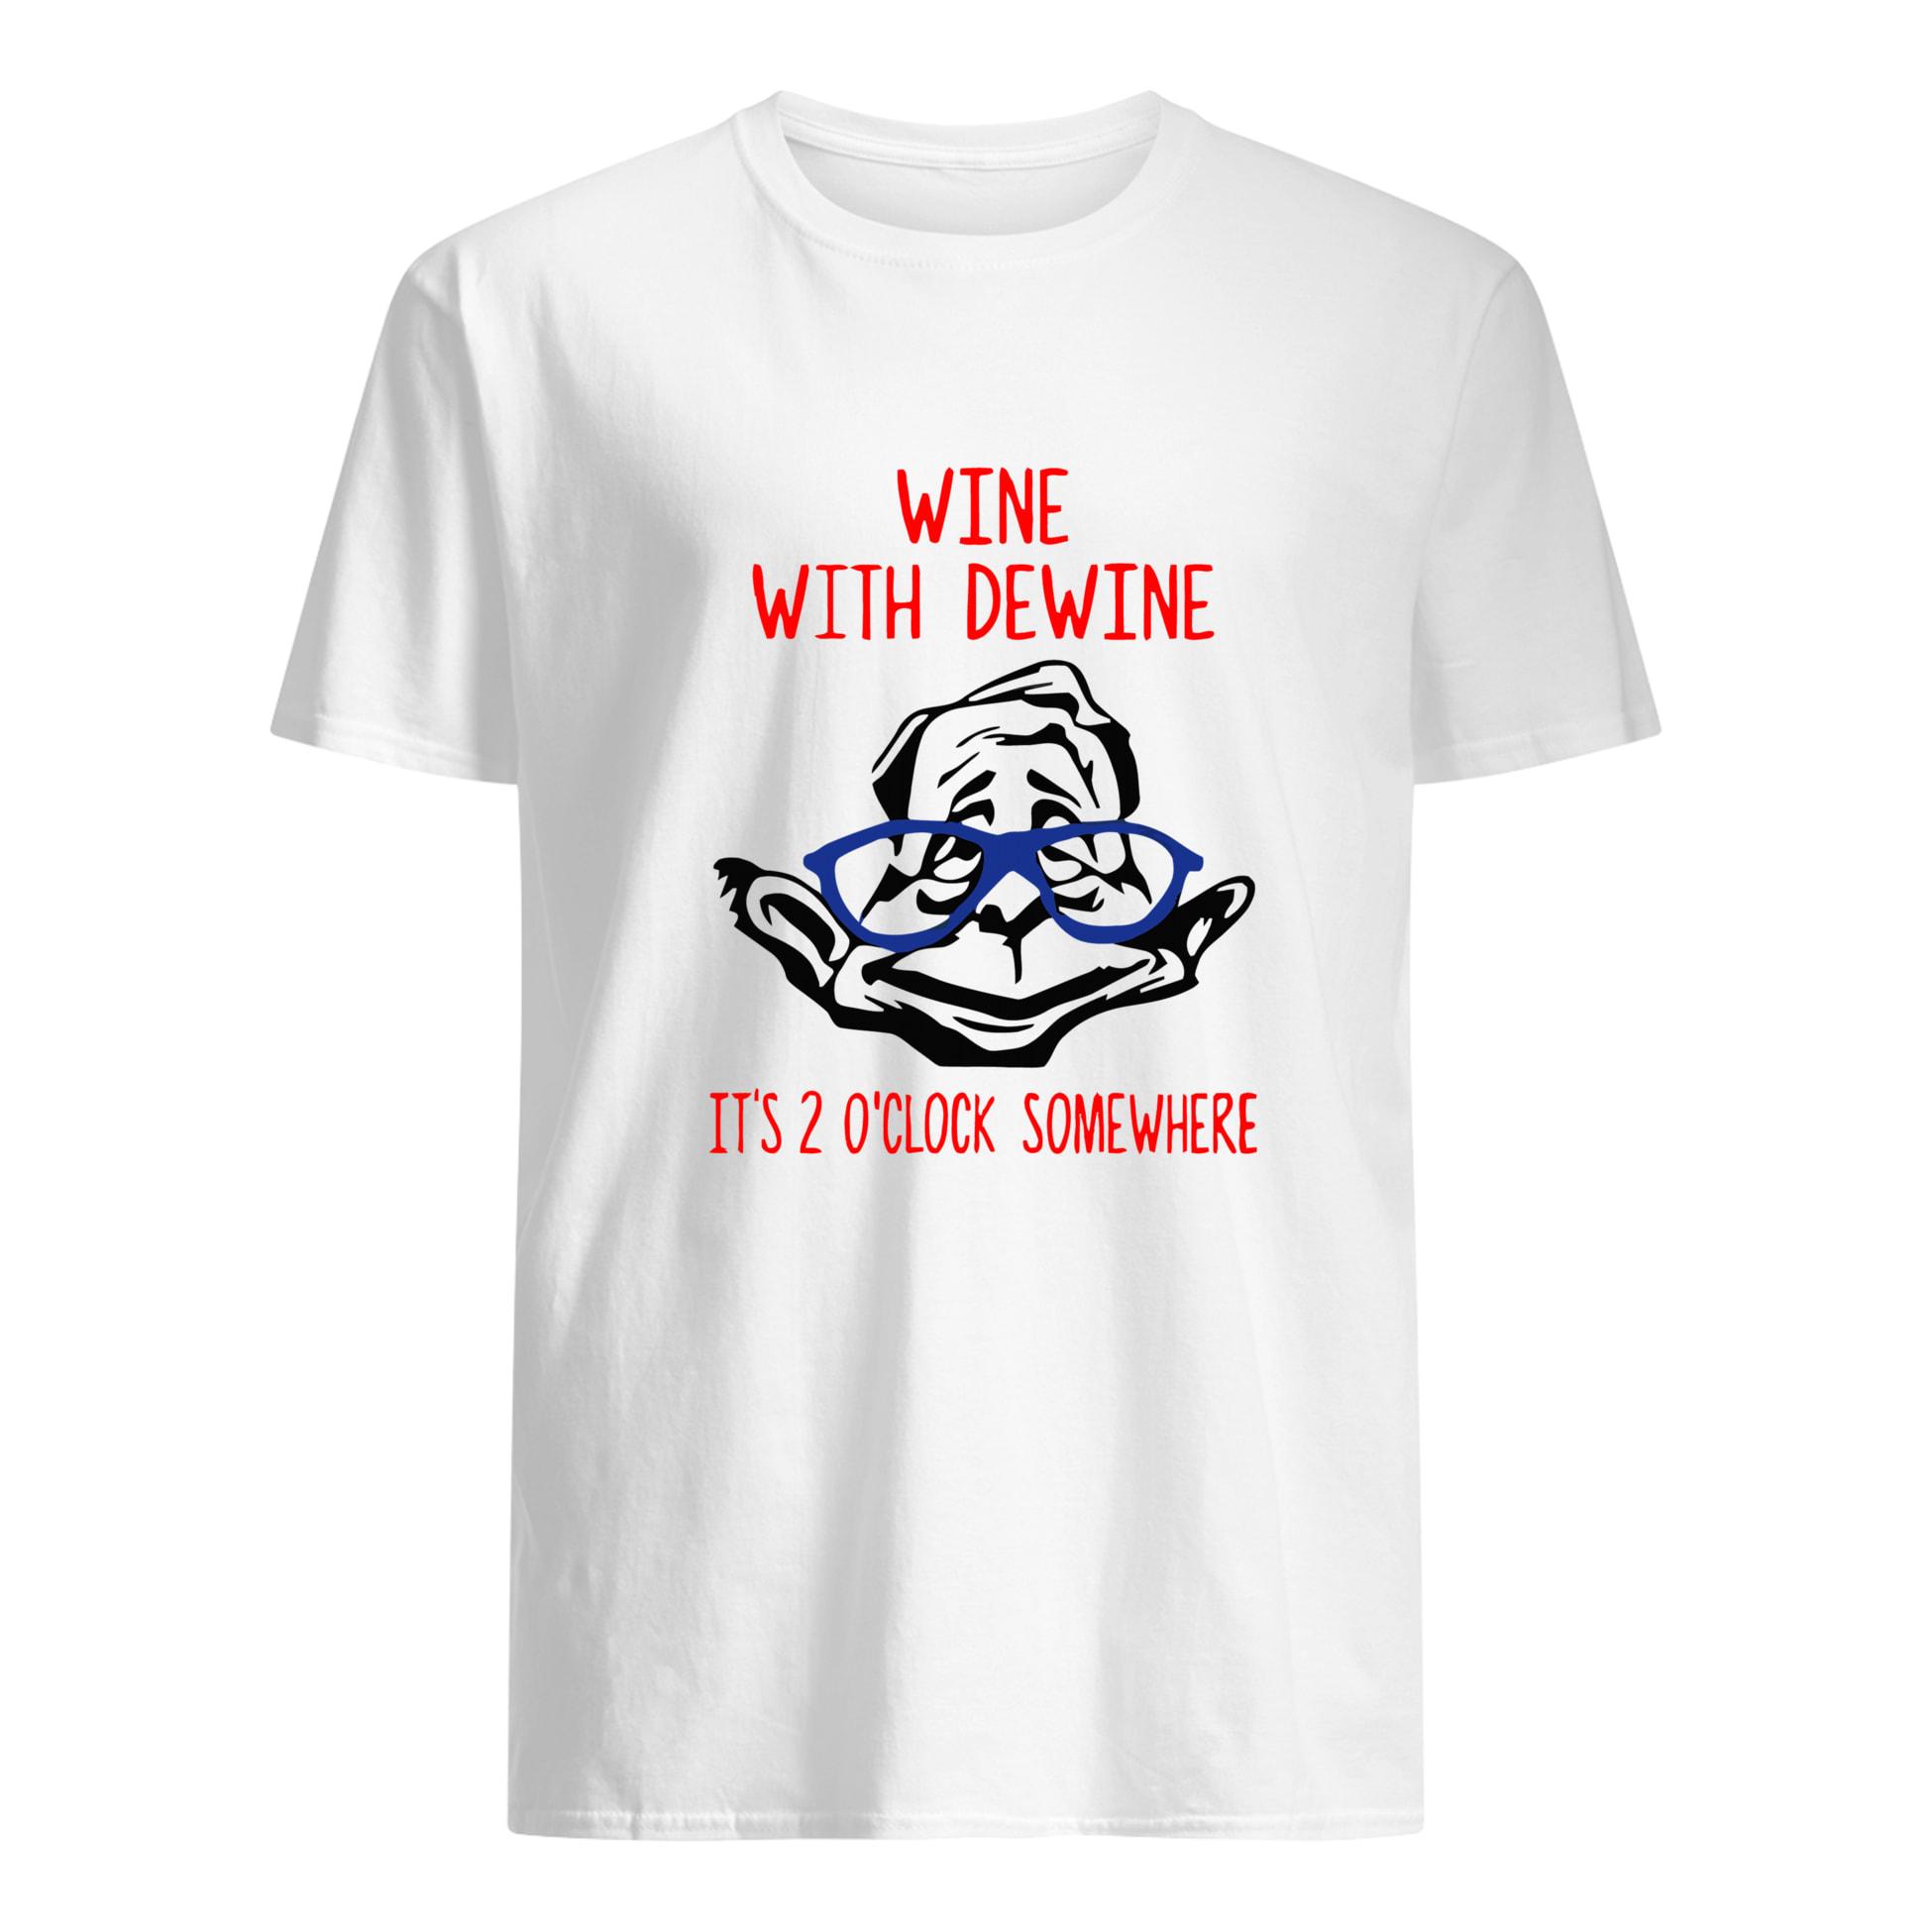 wine with dewine tee